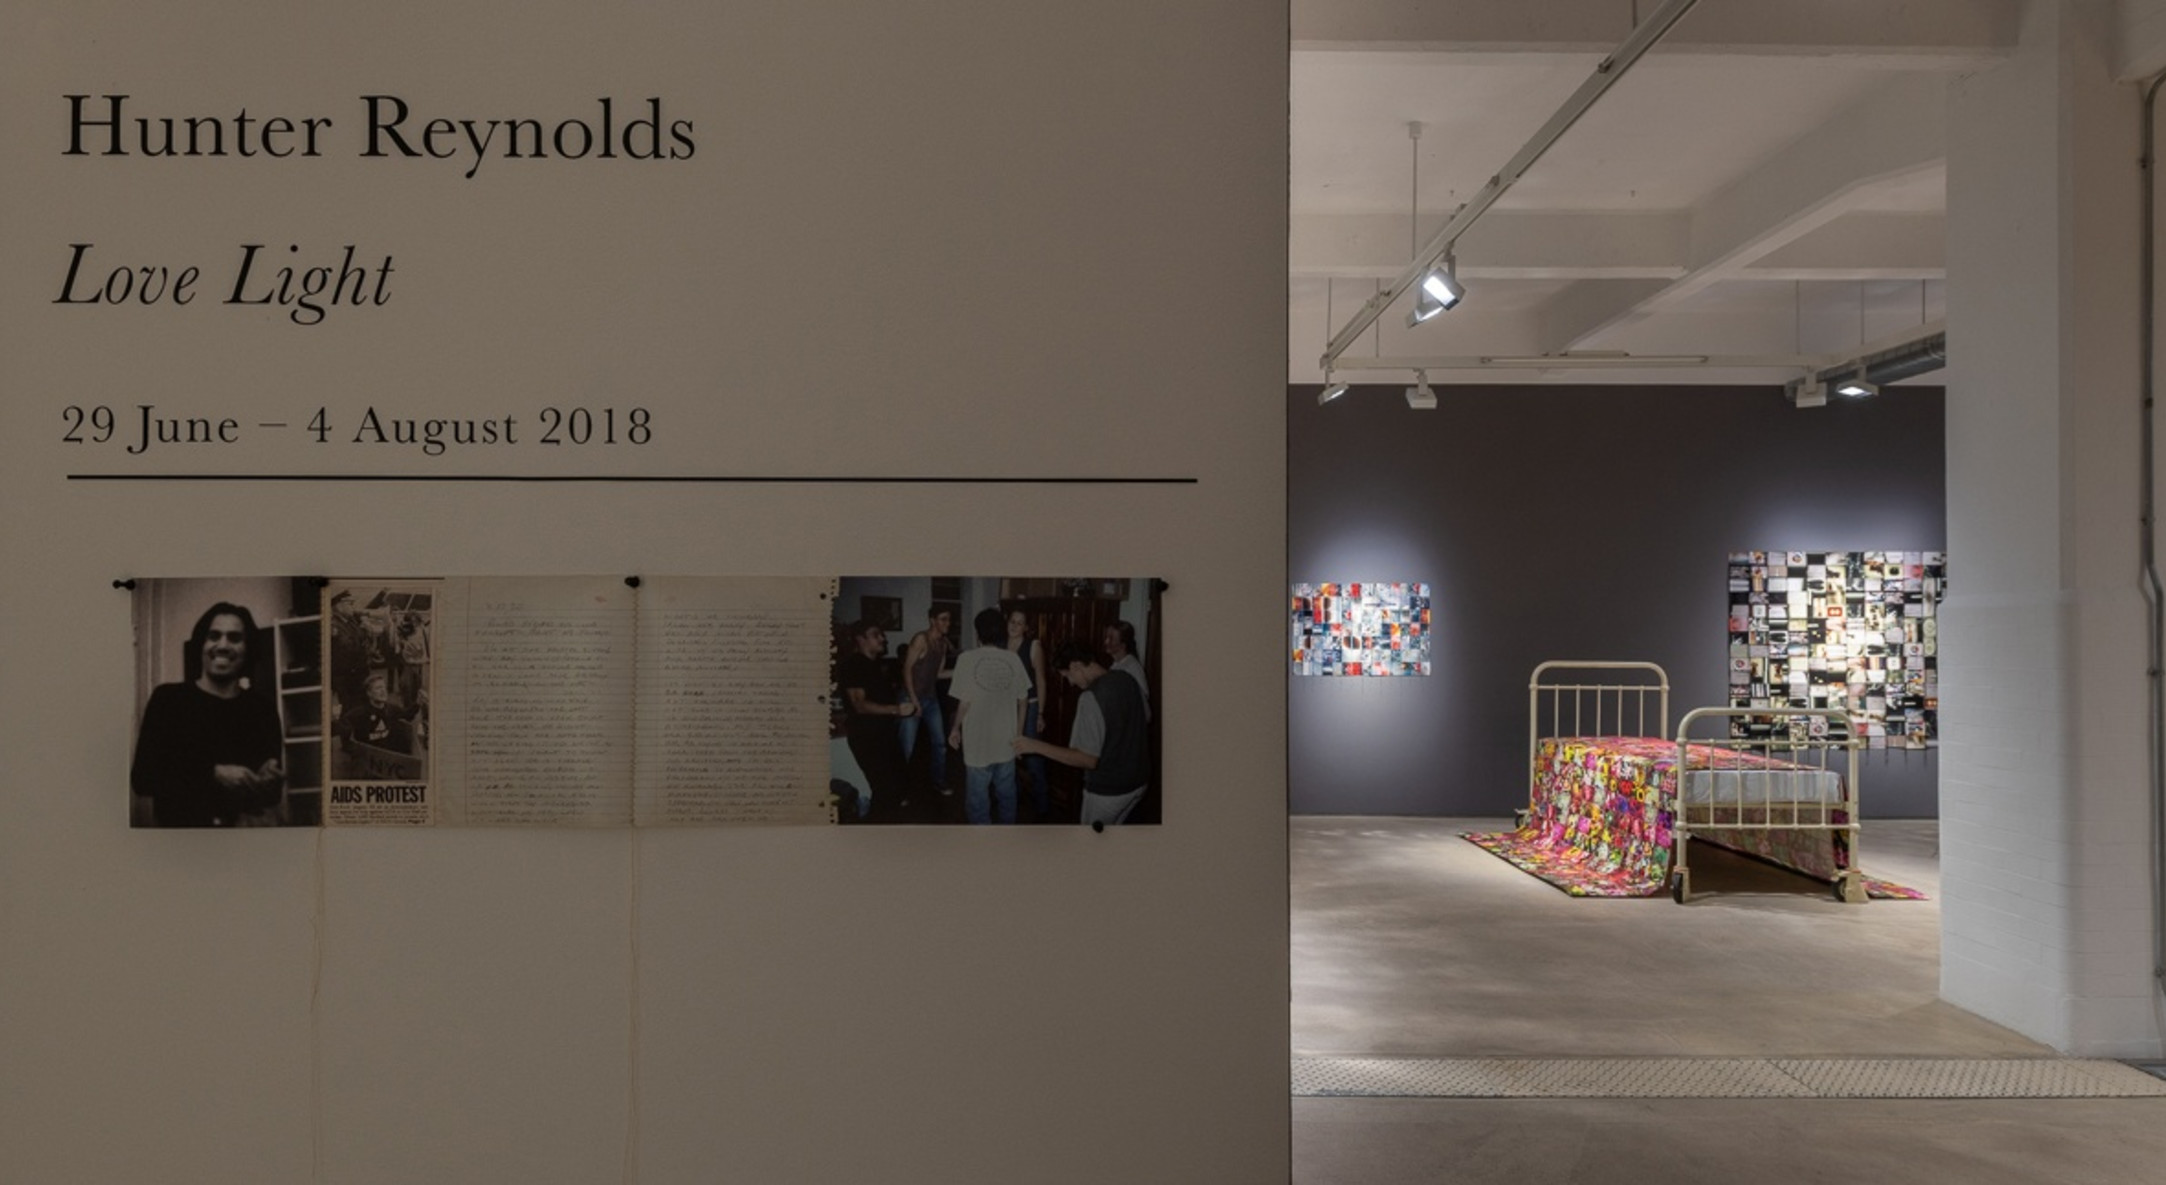 Installation view of Hunter Reynolds, Love Light at Hales london